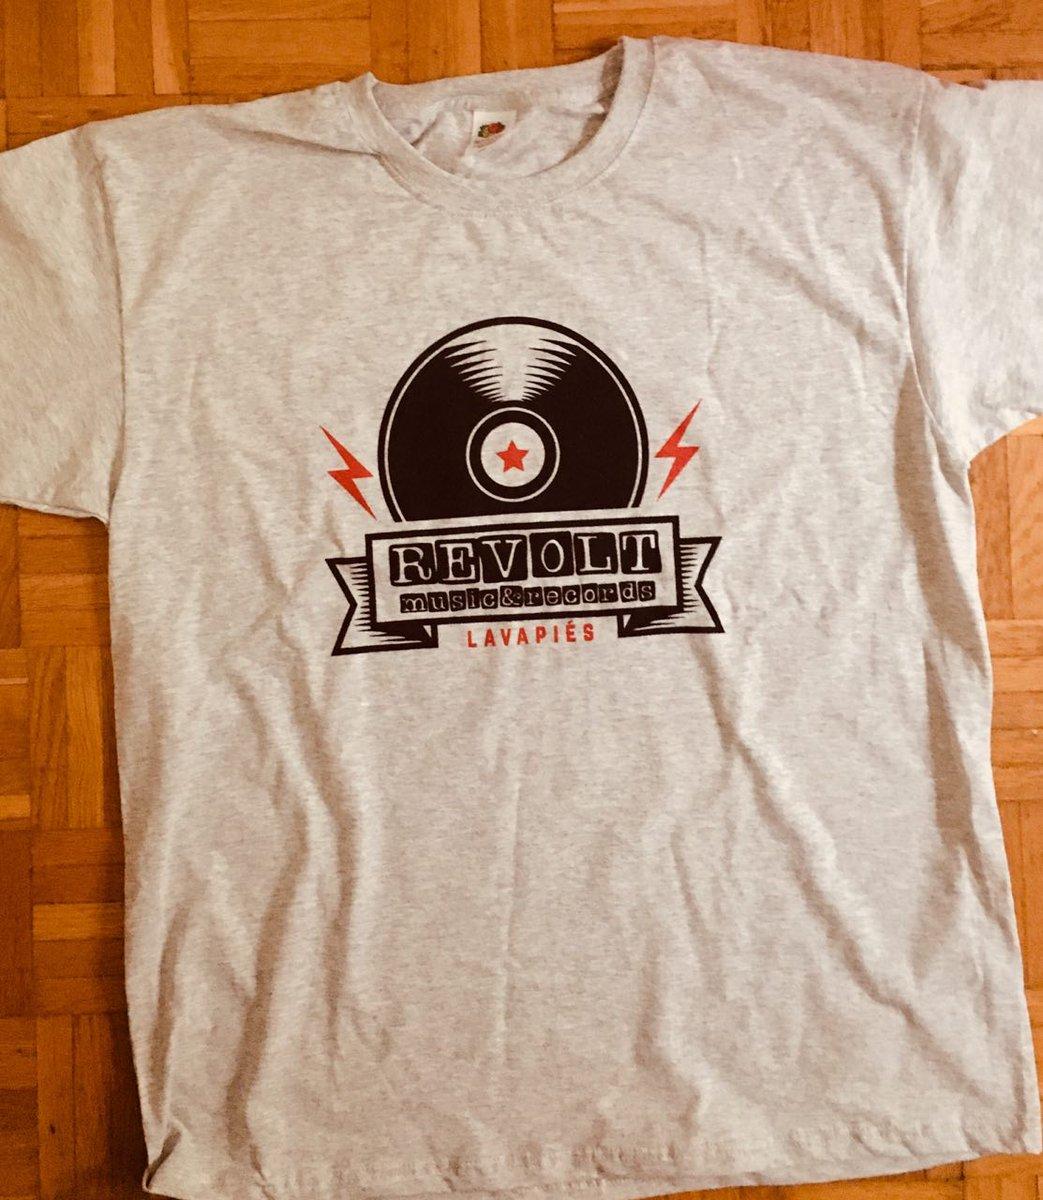 Tenemos nuevas camisetas en #RevoltMusicRecords x 12€. Esperamos que os gusten. Estamos en calle Tribulete 18, pasarse. Lavapiés #tshirts #vinyl #records #Madrid #LoveMusicHateRacism #Punk #Ska #Reggae #Soul #Jazz #Flamenco #Trap #hiphop #techno #RockAgainstRacism